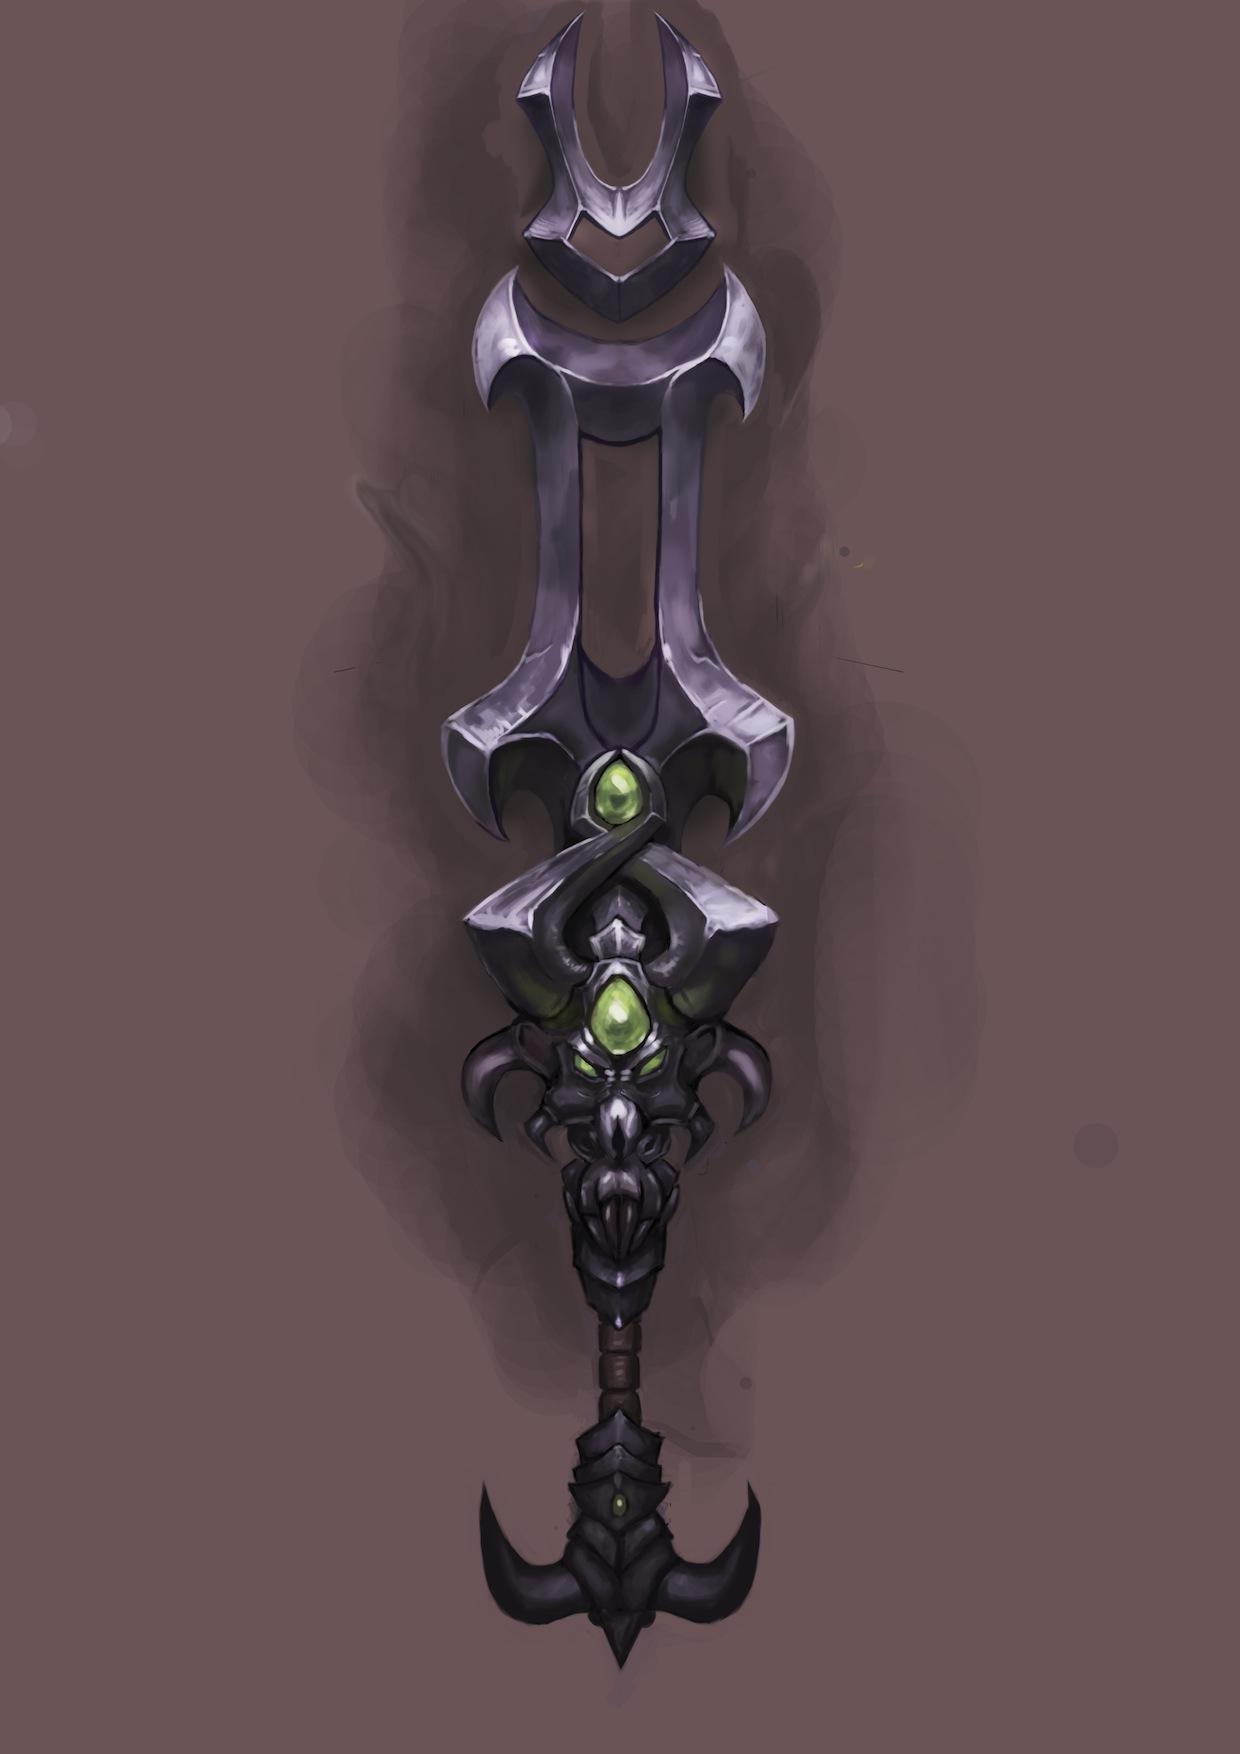 Ominous Purple WoW Sword